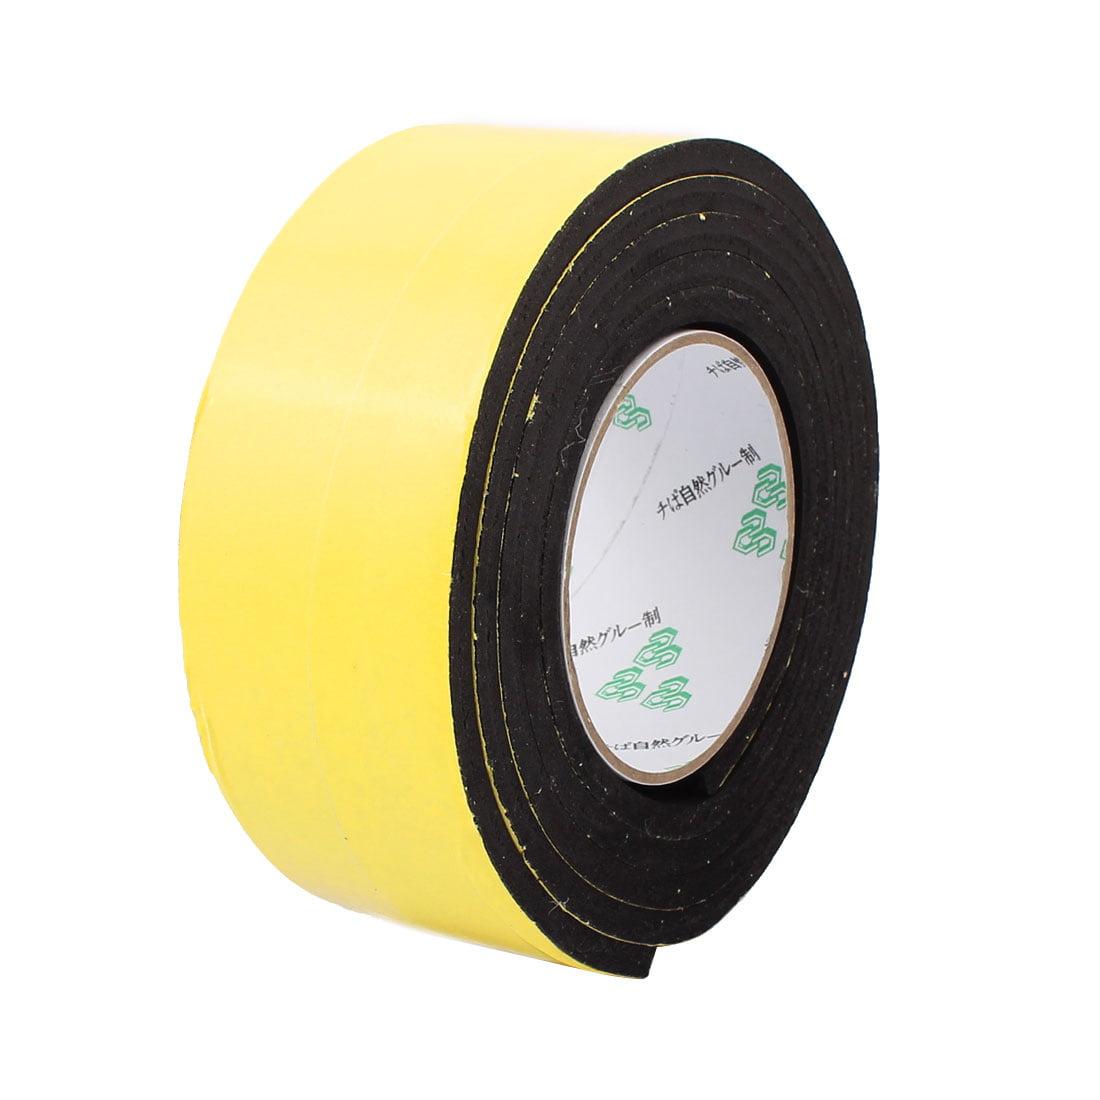 55mm x 6mm Single Sided Self Adhesive Shockproof Sponge Foam Tape 2M Length